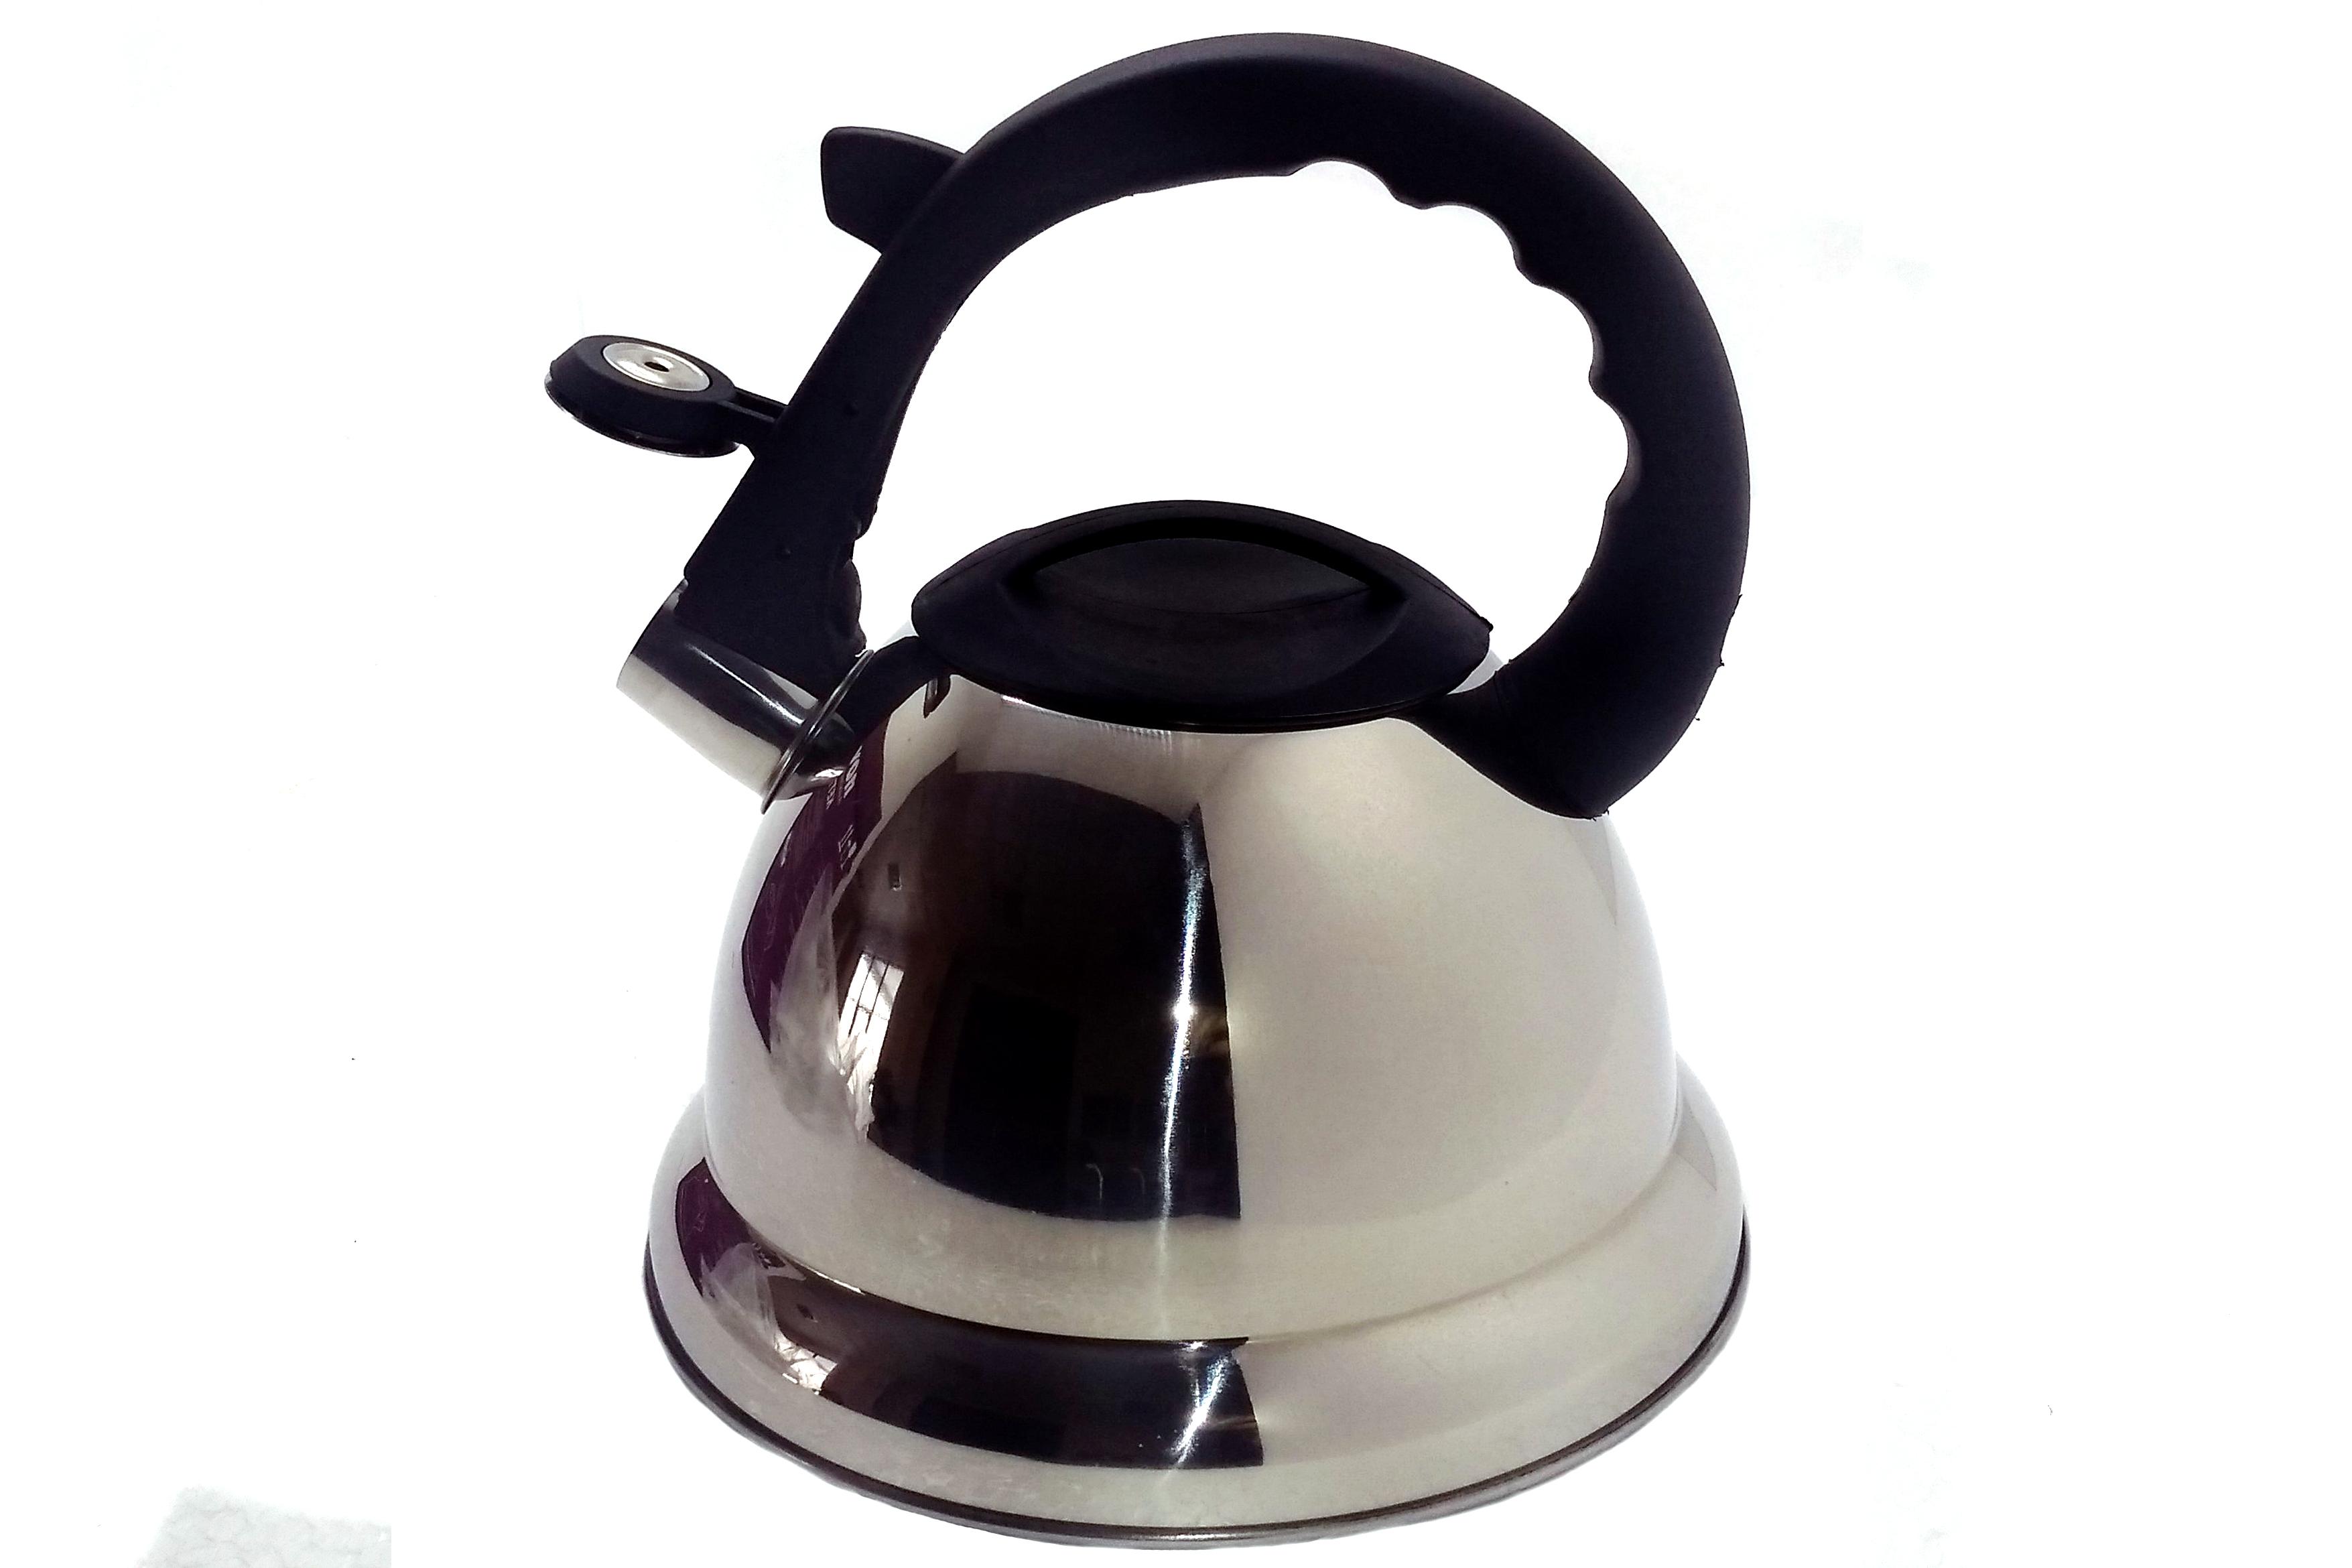 Чайник нержавеющий 2.8л. со свистком